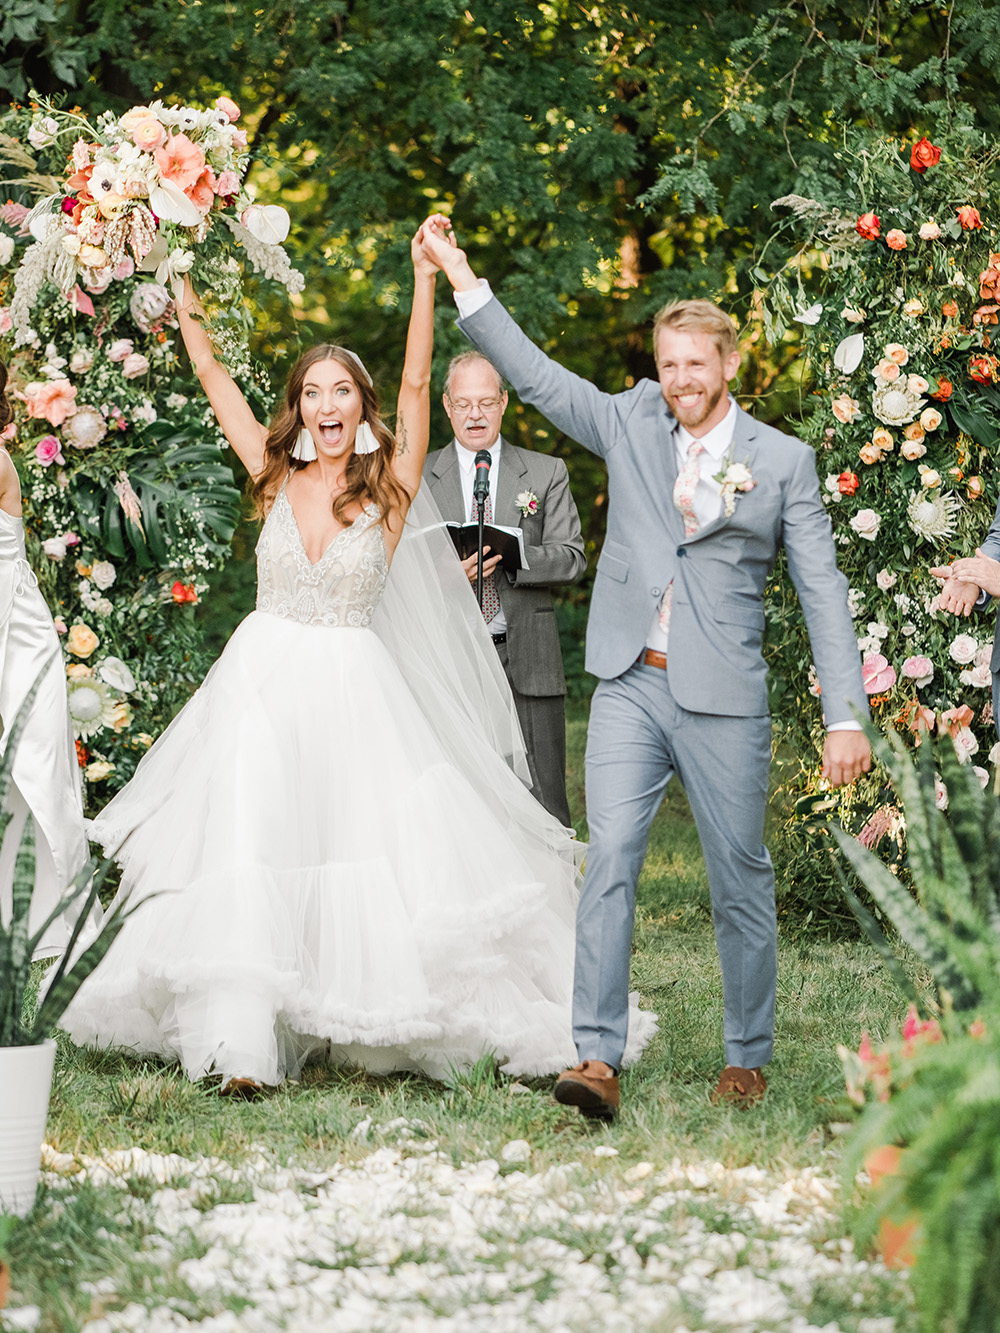 India___Corey___The_Wedding_-383.jpg